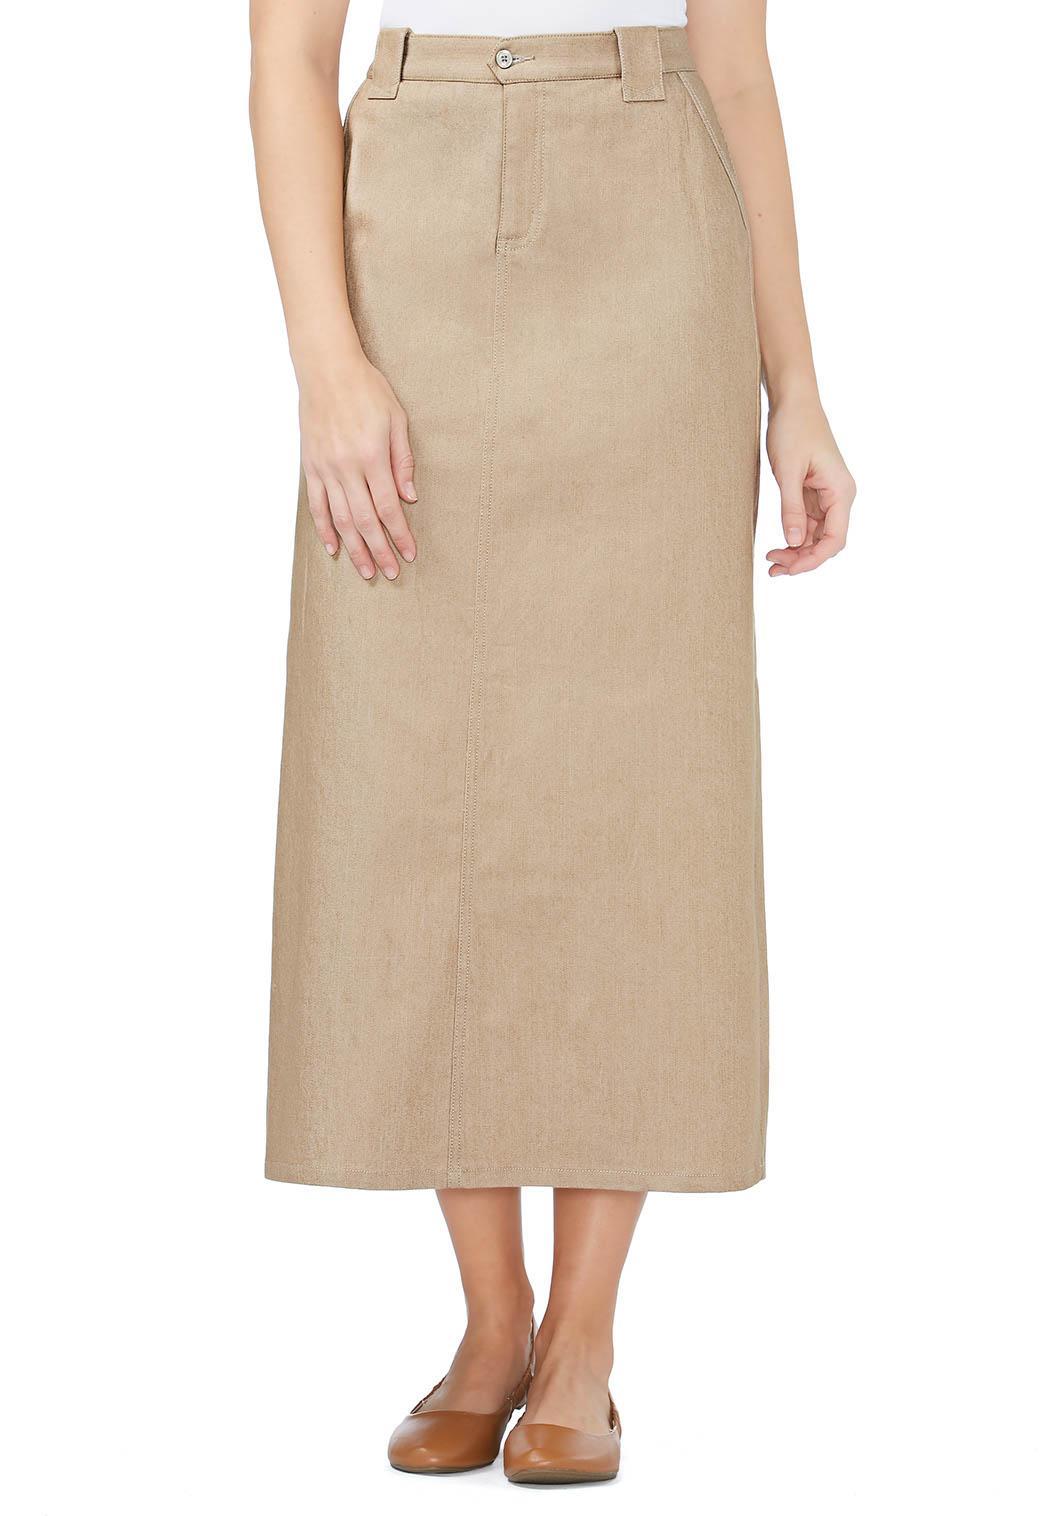 Cato Plus Size Dresses